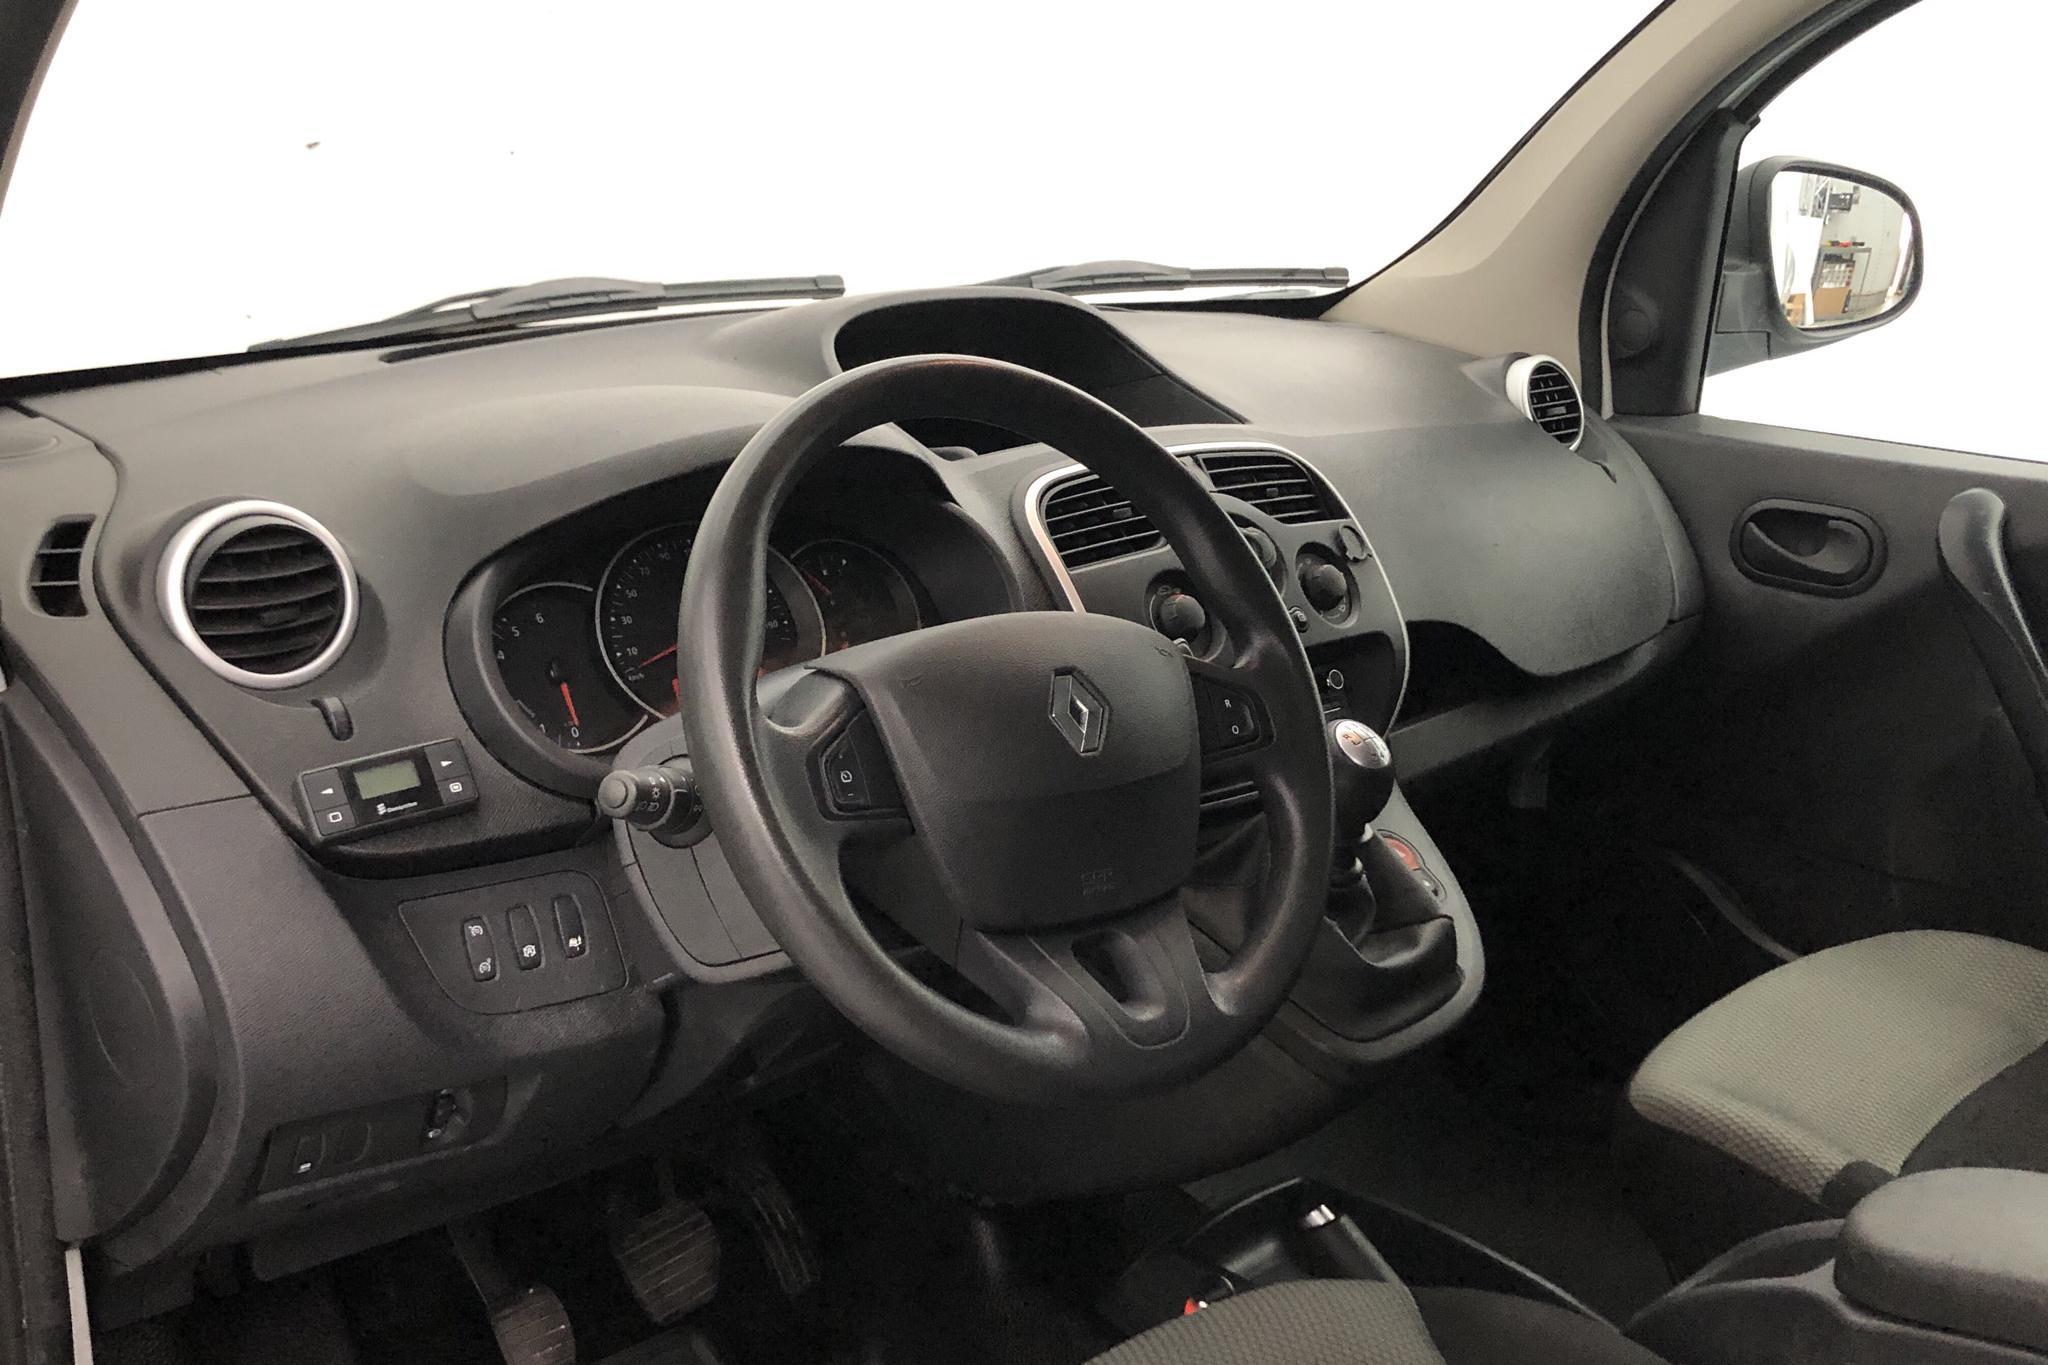 Renault Kangoo 1.5 dCi Maxi Skåp (110hk) - 11 733 mil - Manuell - 2017